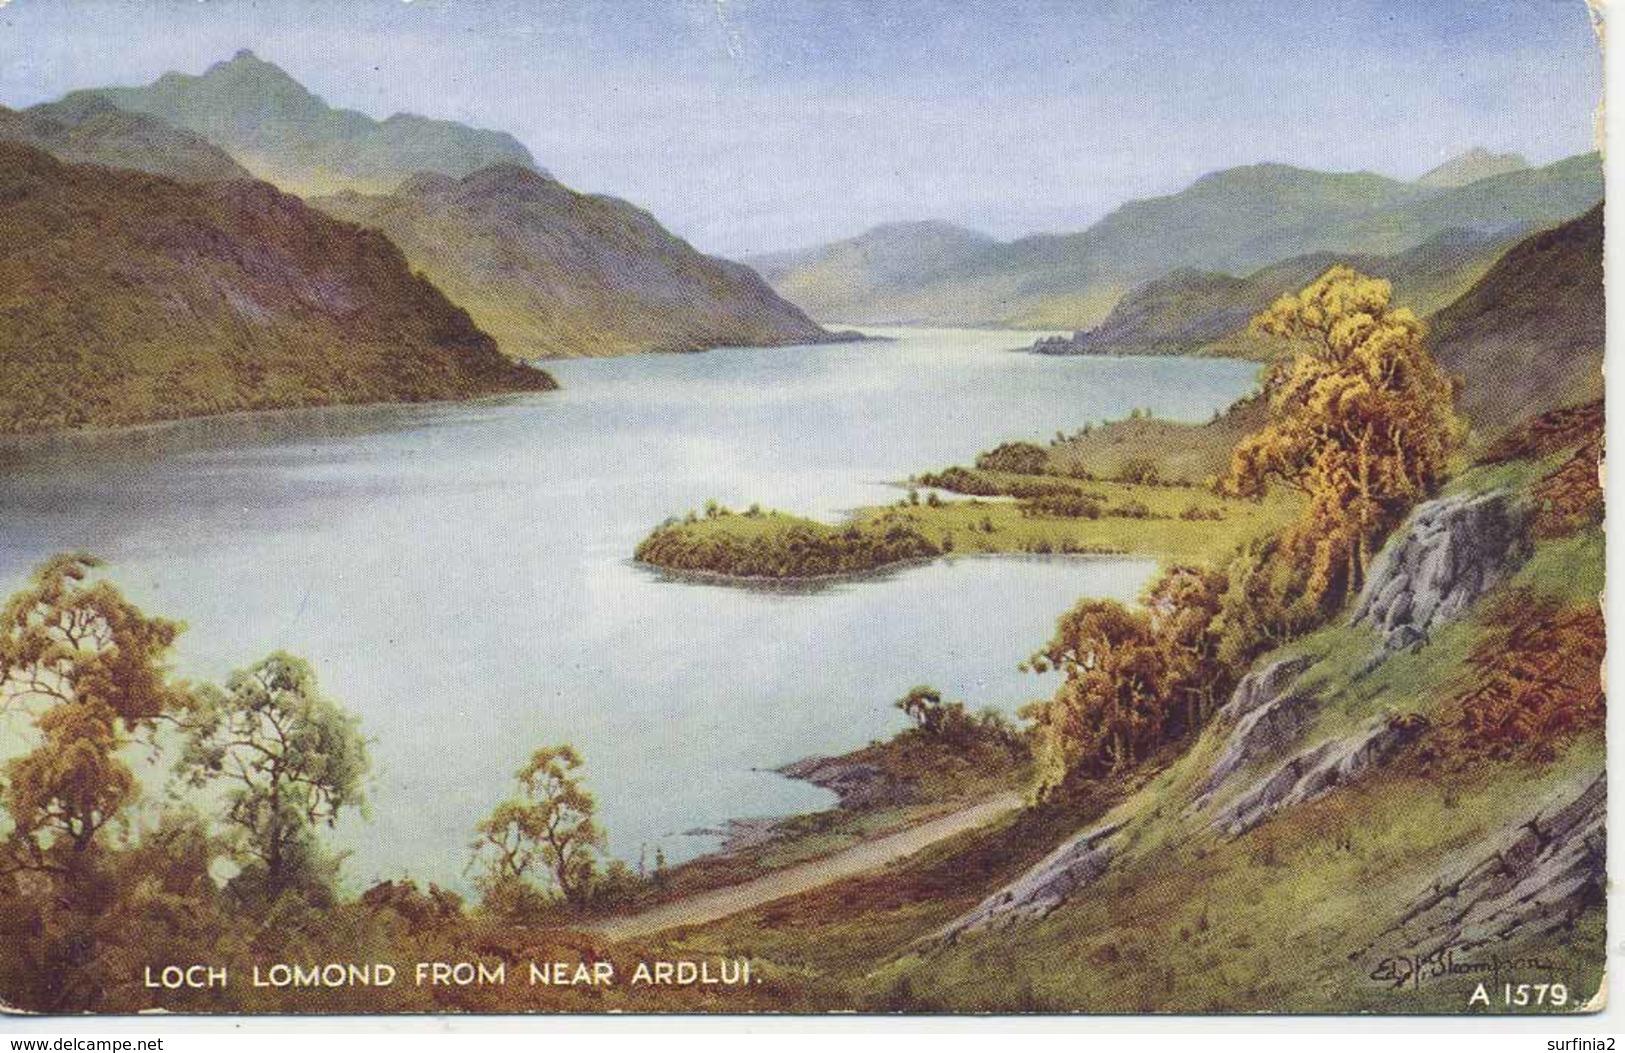 VALENTINES ART A1579 - LOCH LOMOND FROM NEAR ARDLUI - E H THOMPSON - Inverness-shire